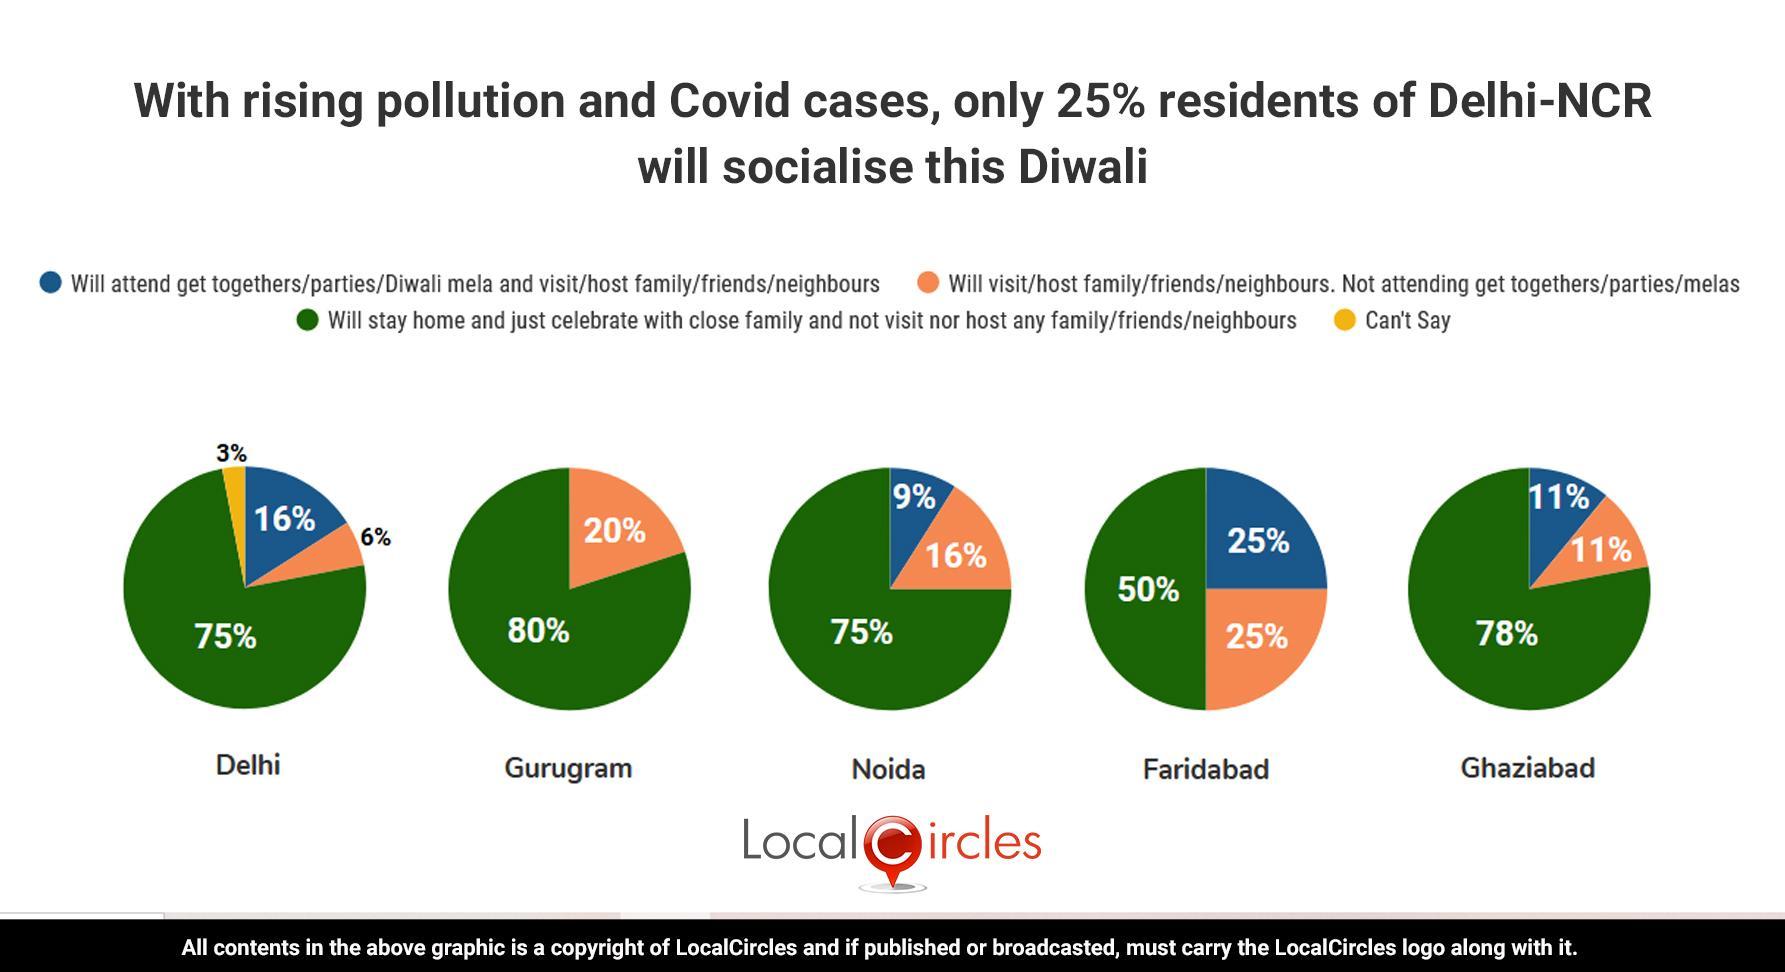 via_LocalCircles_Delhi_NCR_AQI_Polls_-_Summary_-_2___20201111083515___.jpg